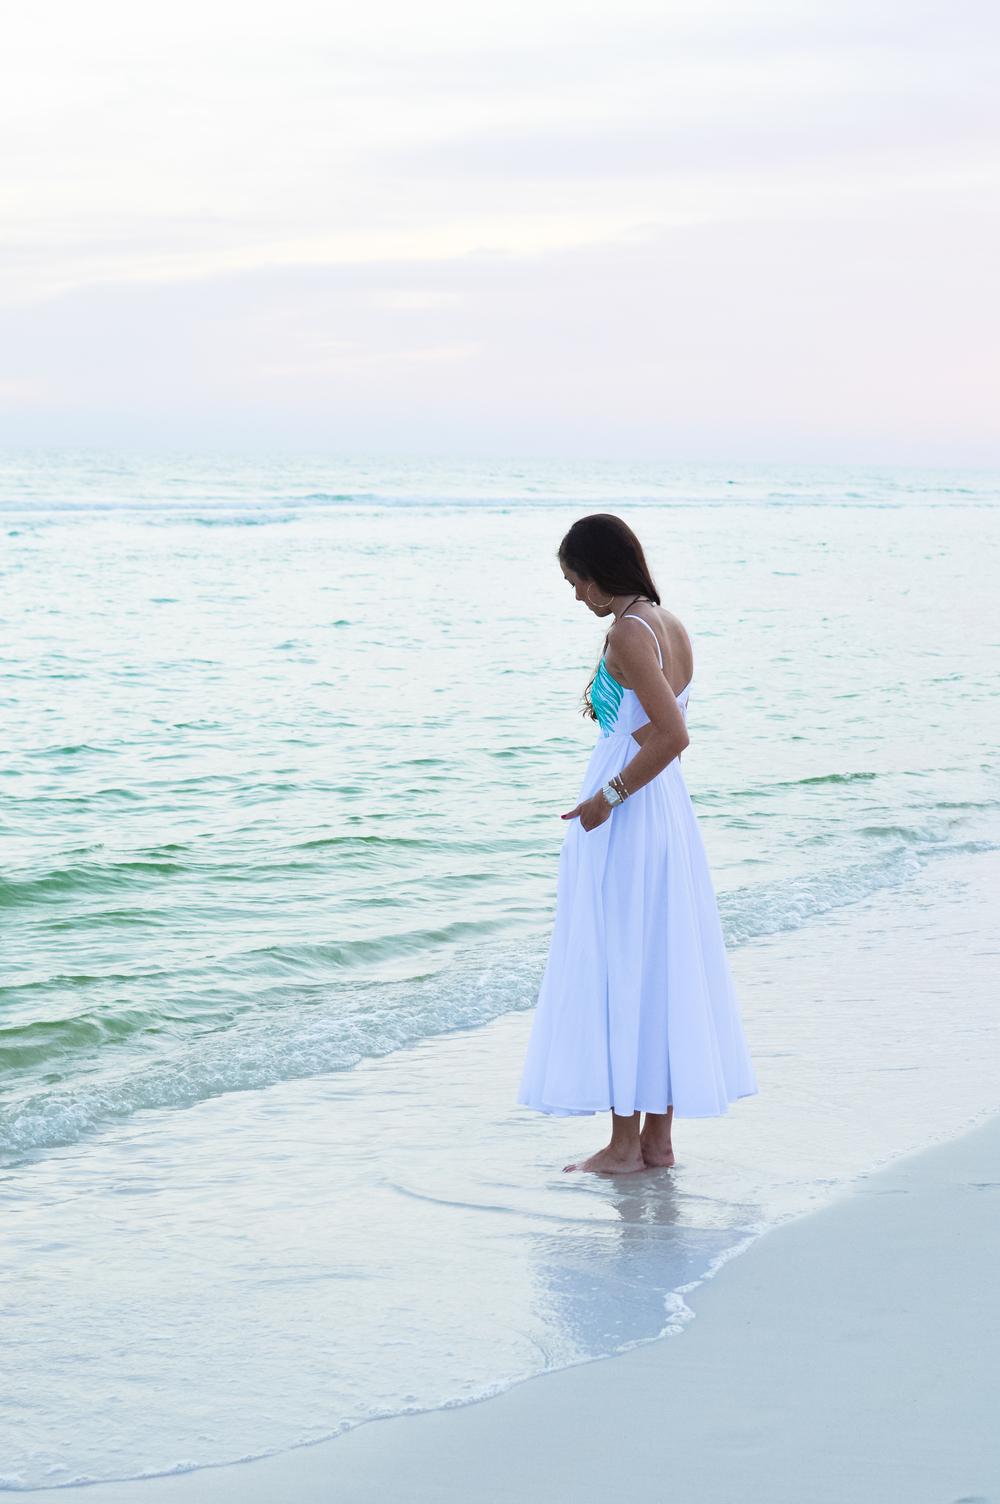 lcb_style_fashion_blogger_seaside florida (25 of 32).jpg